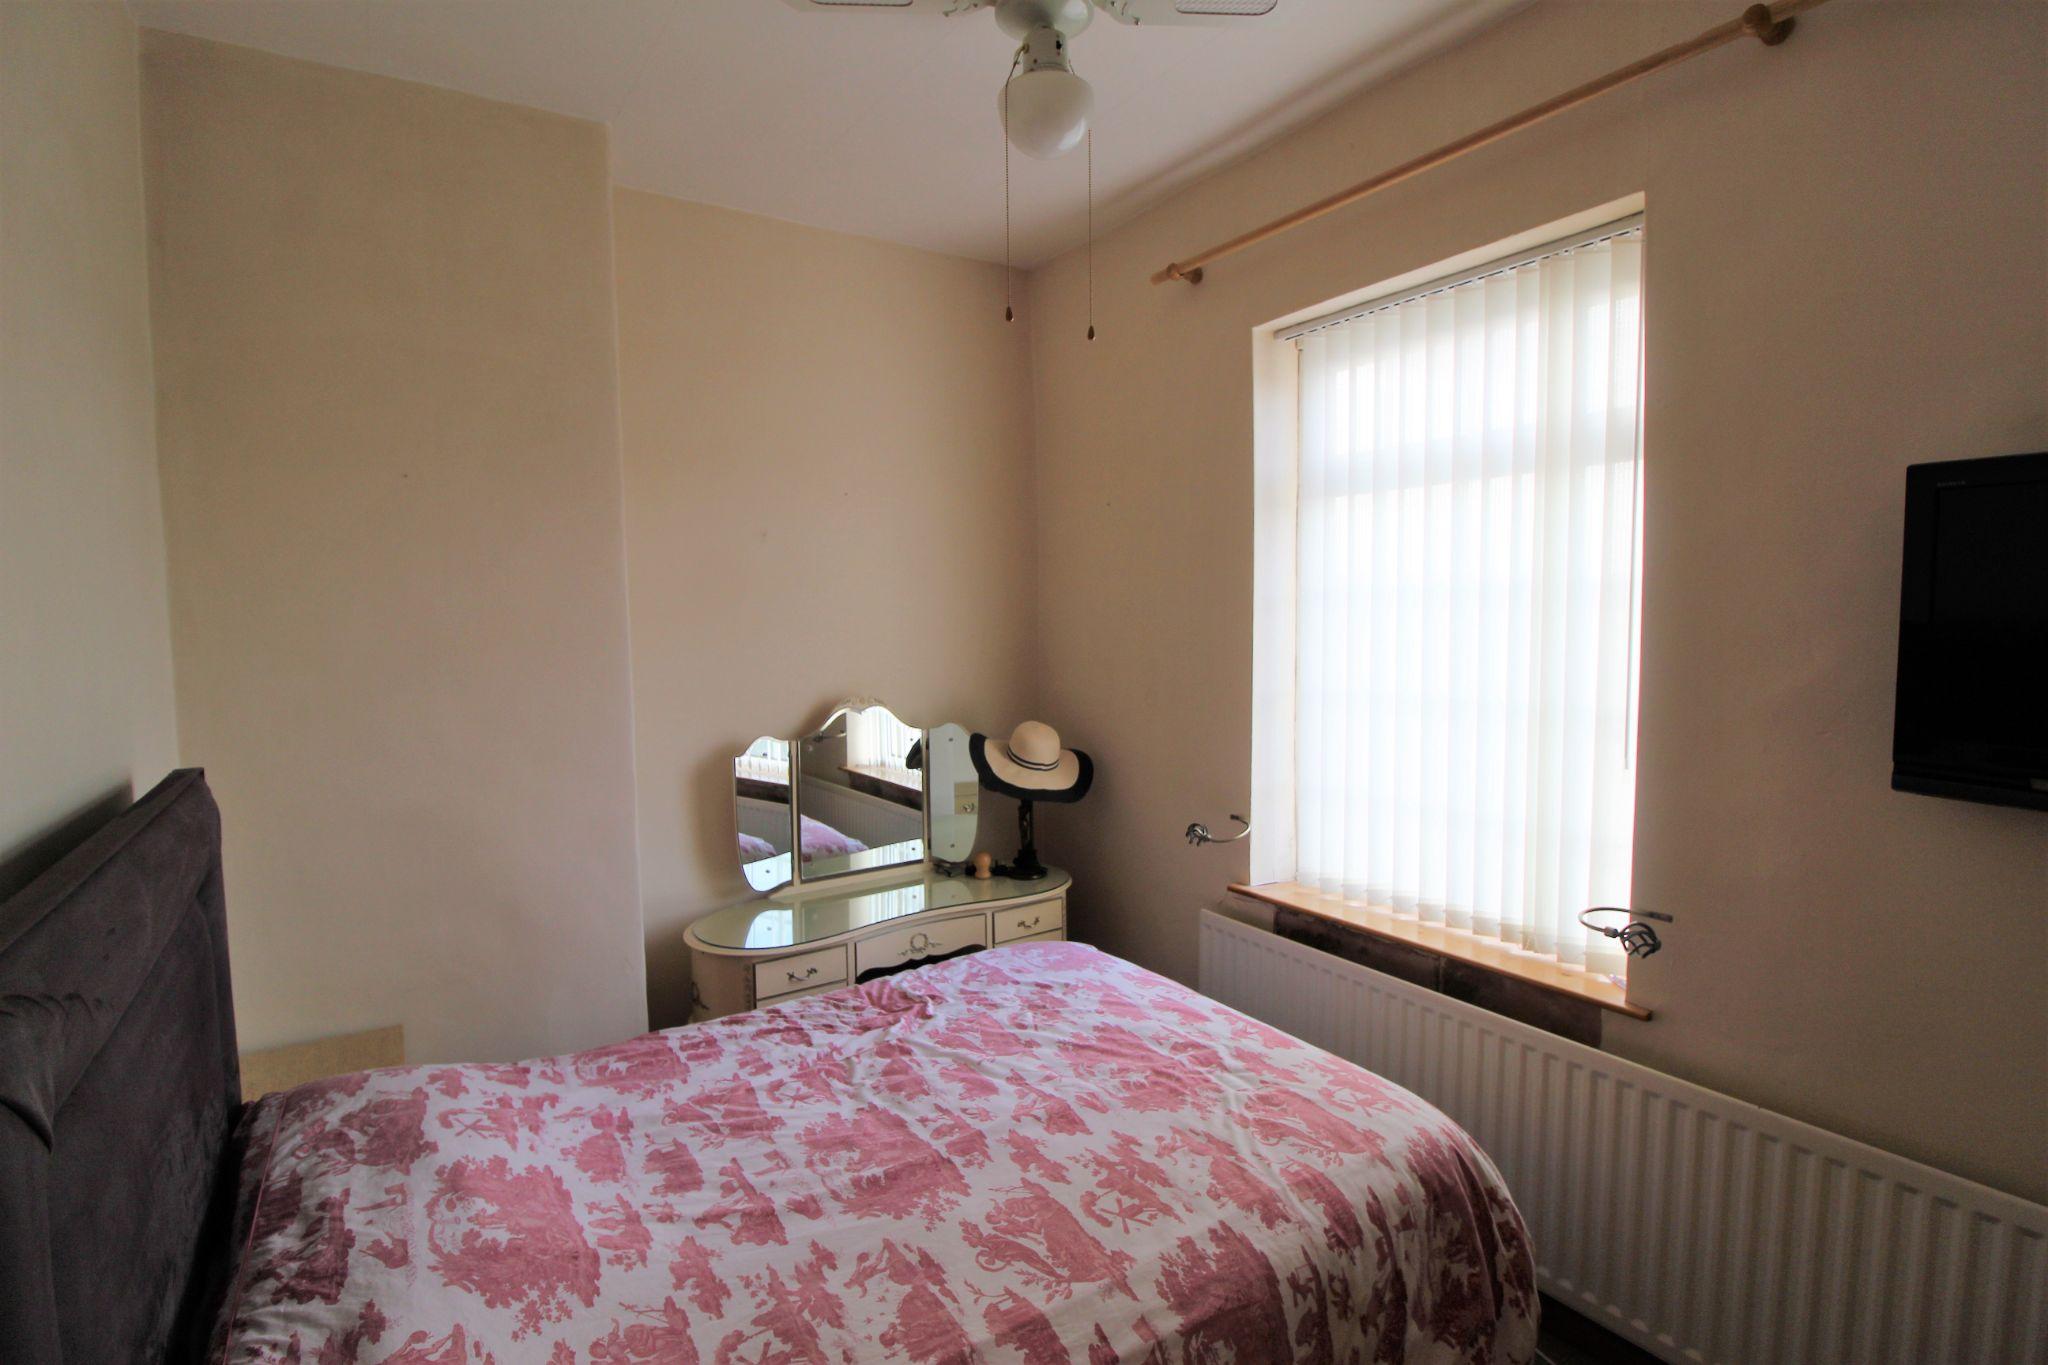 2 bedroom cottage house Let in Wakefield - Bedroom 1